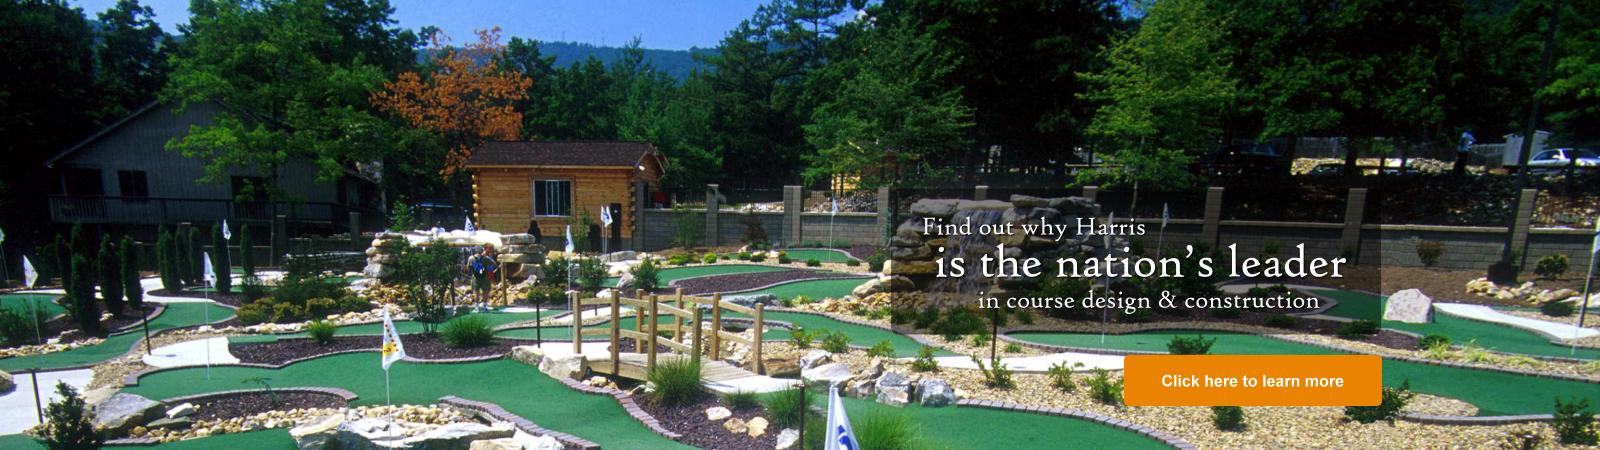 leading builder mini golf ga